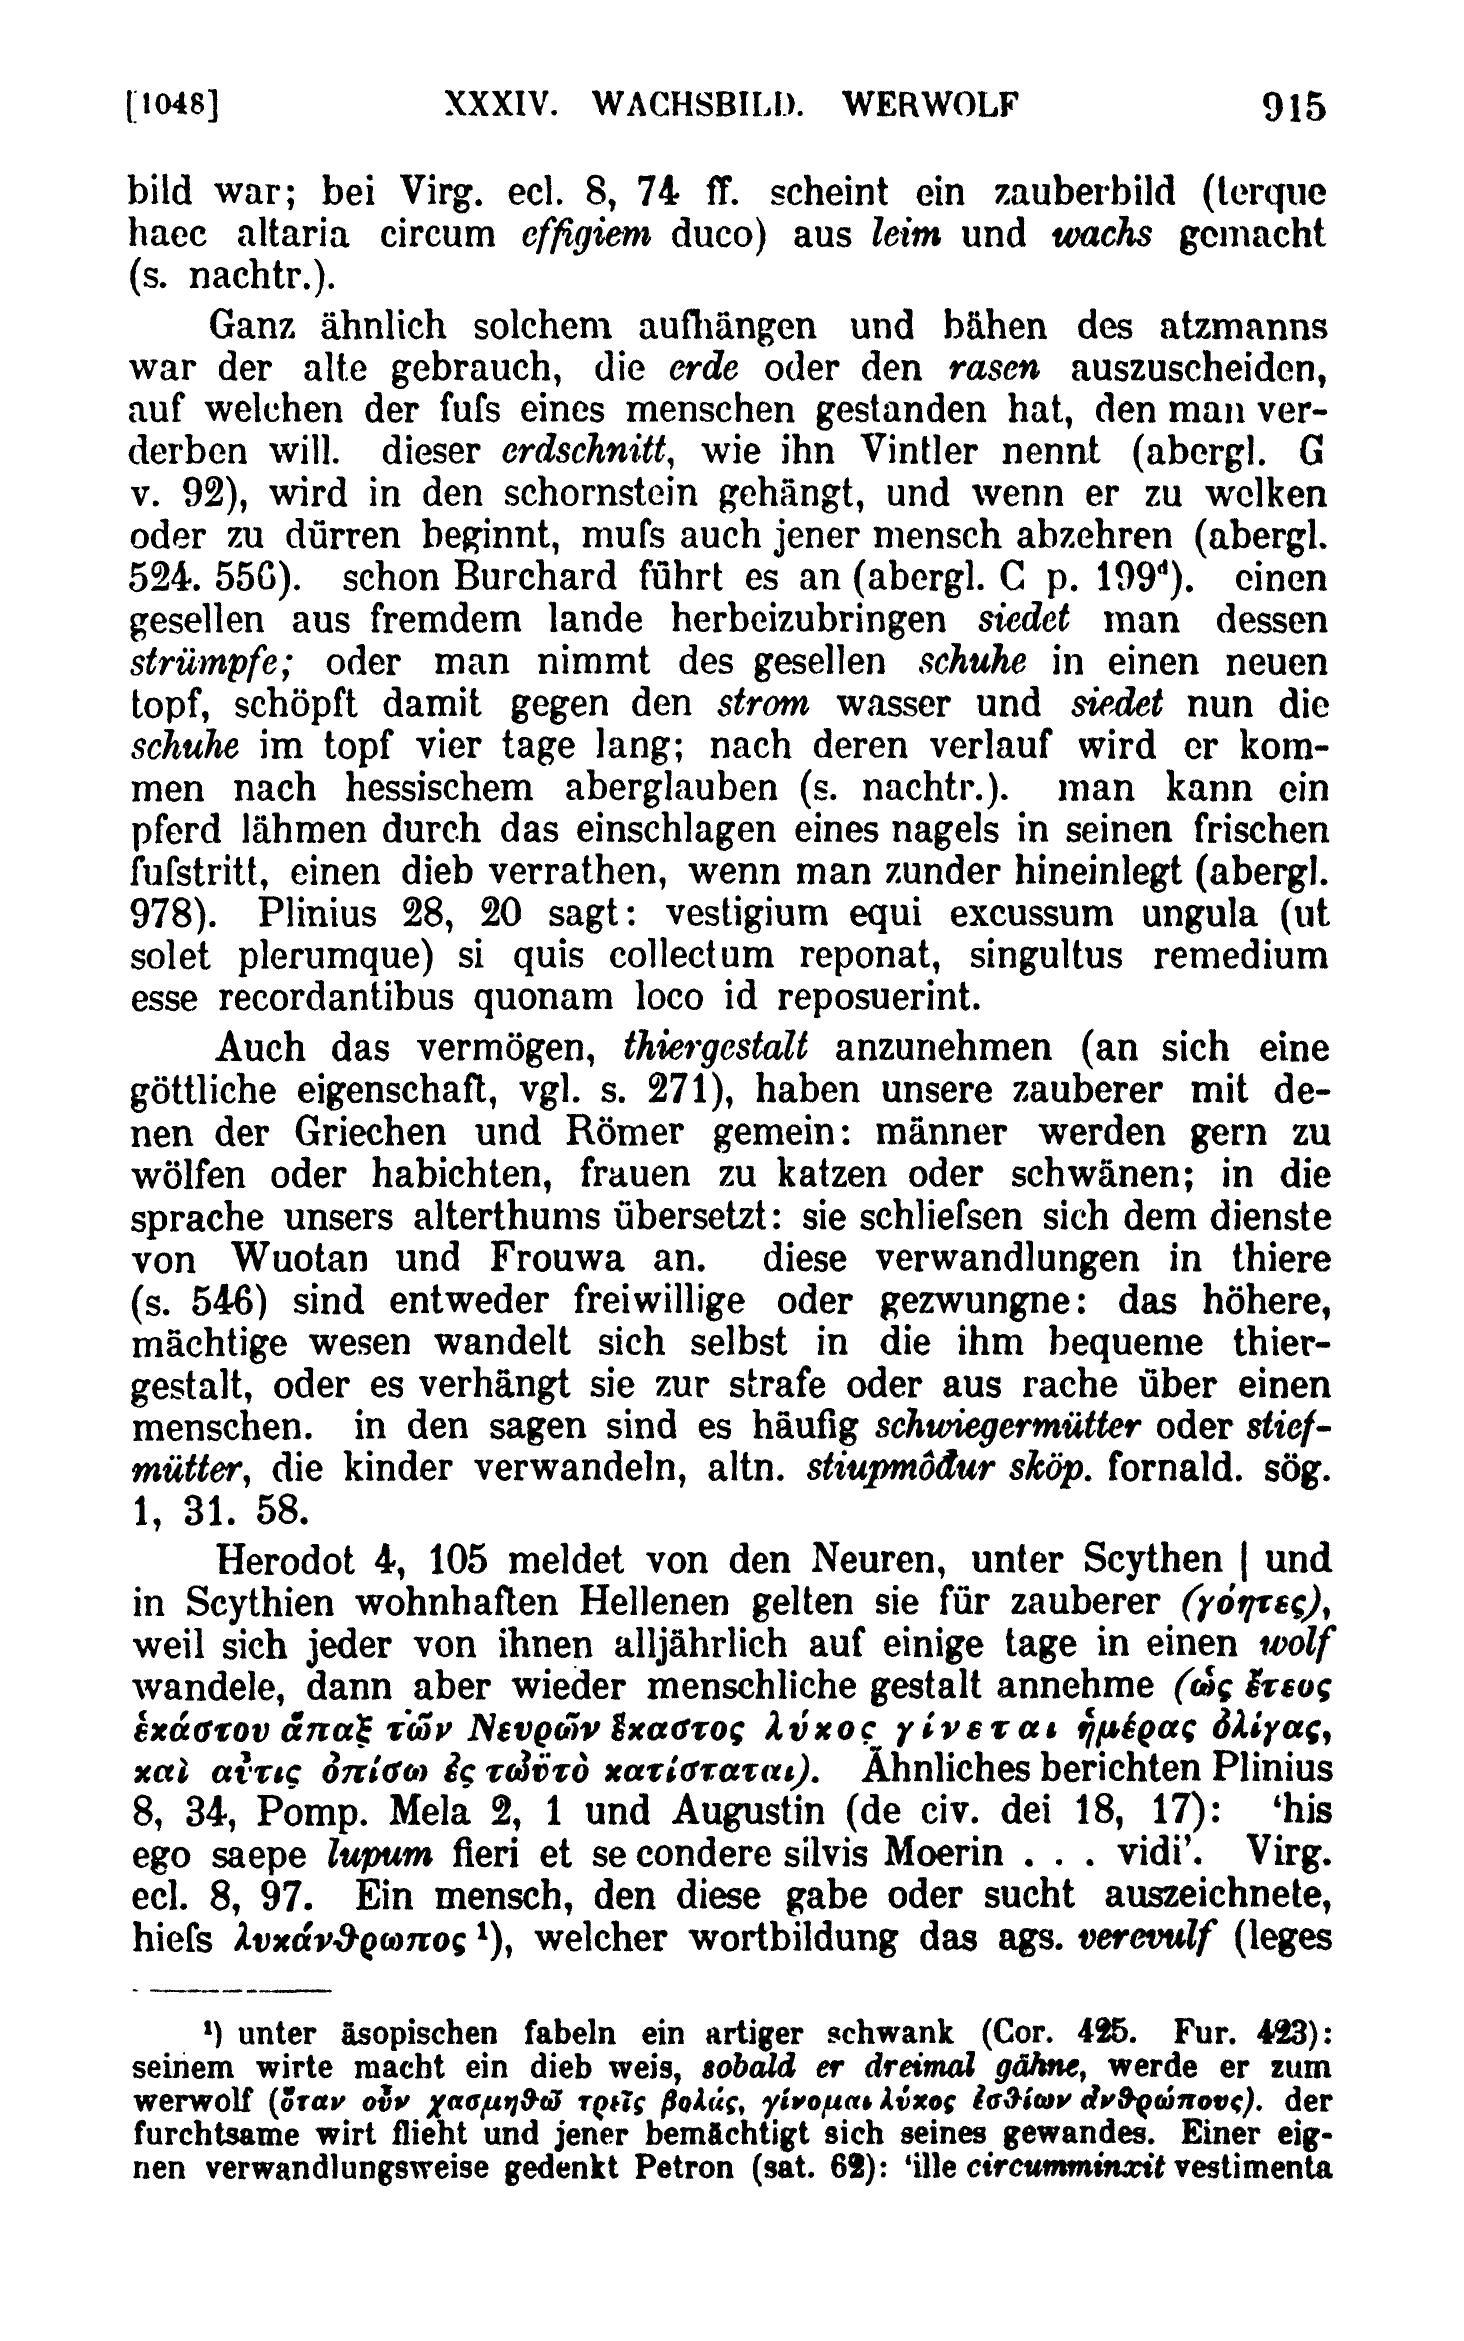 File:Deutsche Mythologie (Grimm) V2 379.jpg - Wikimedia Commons